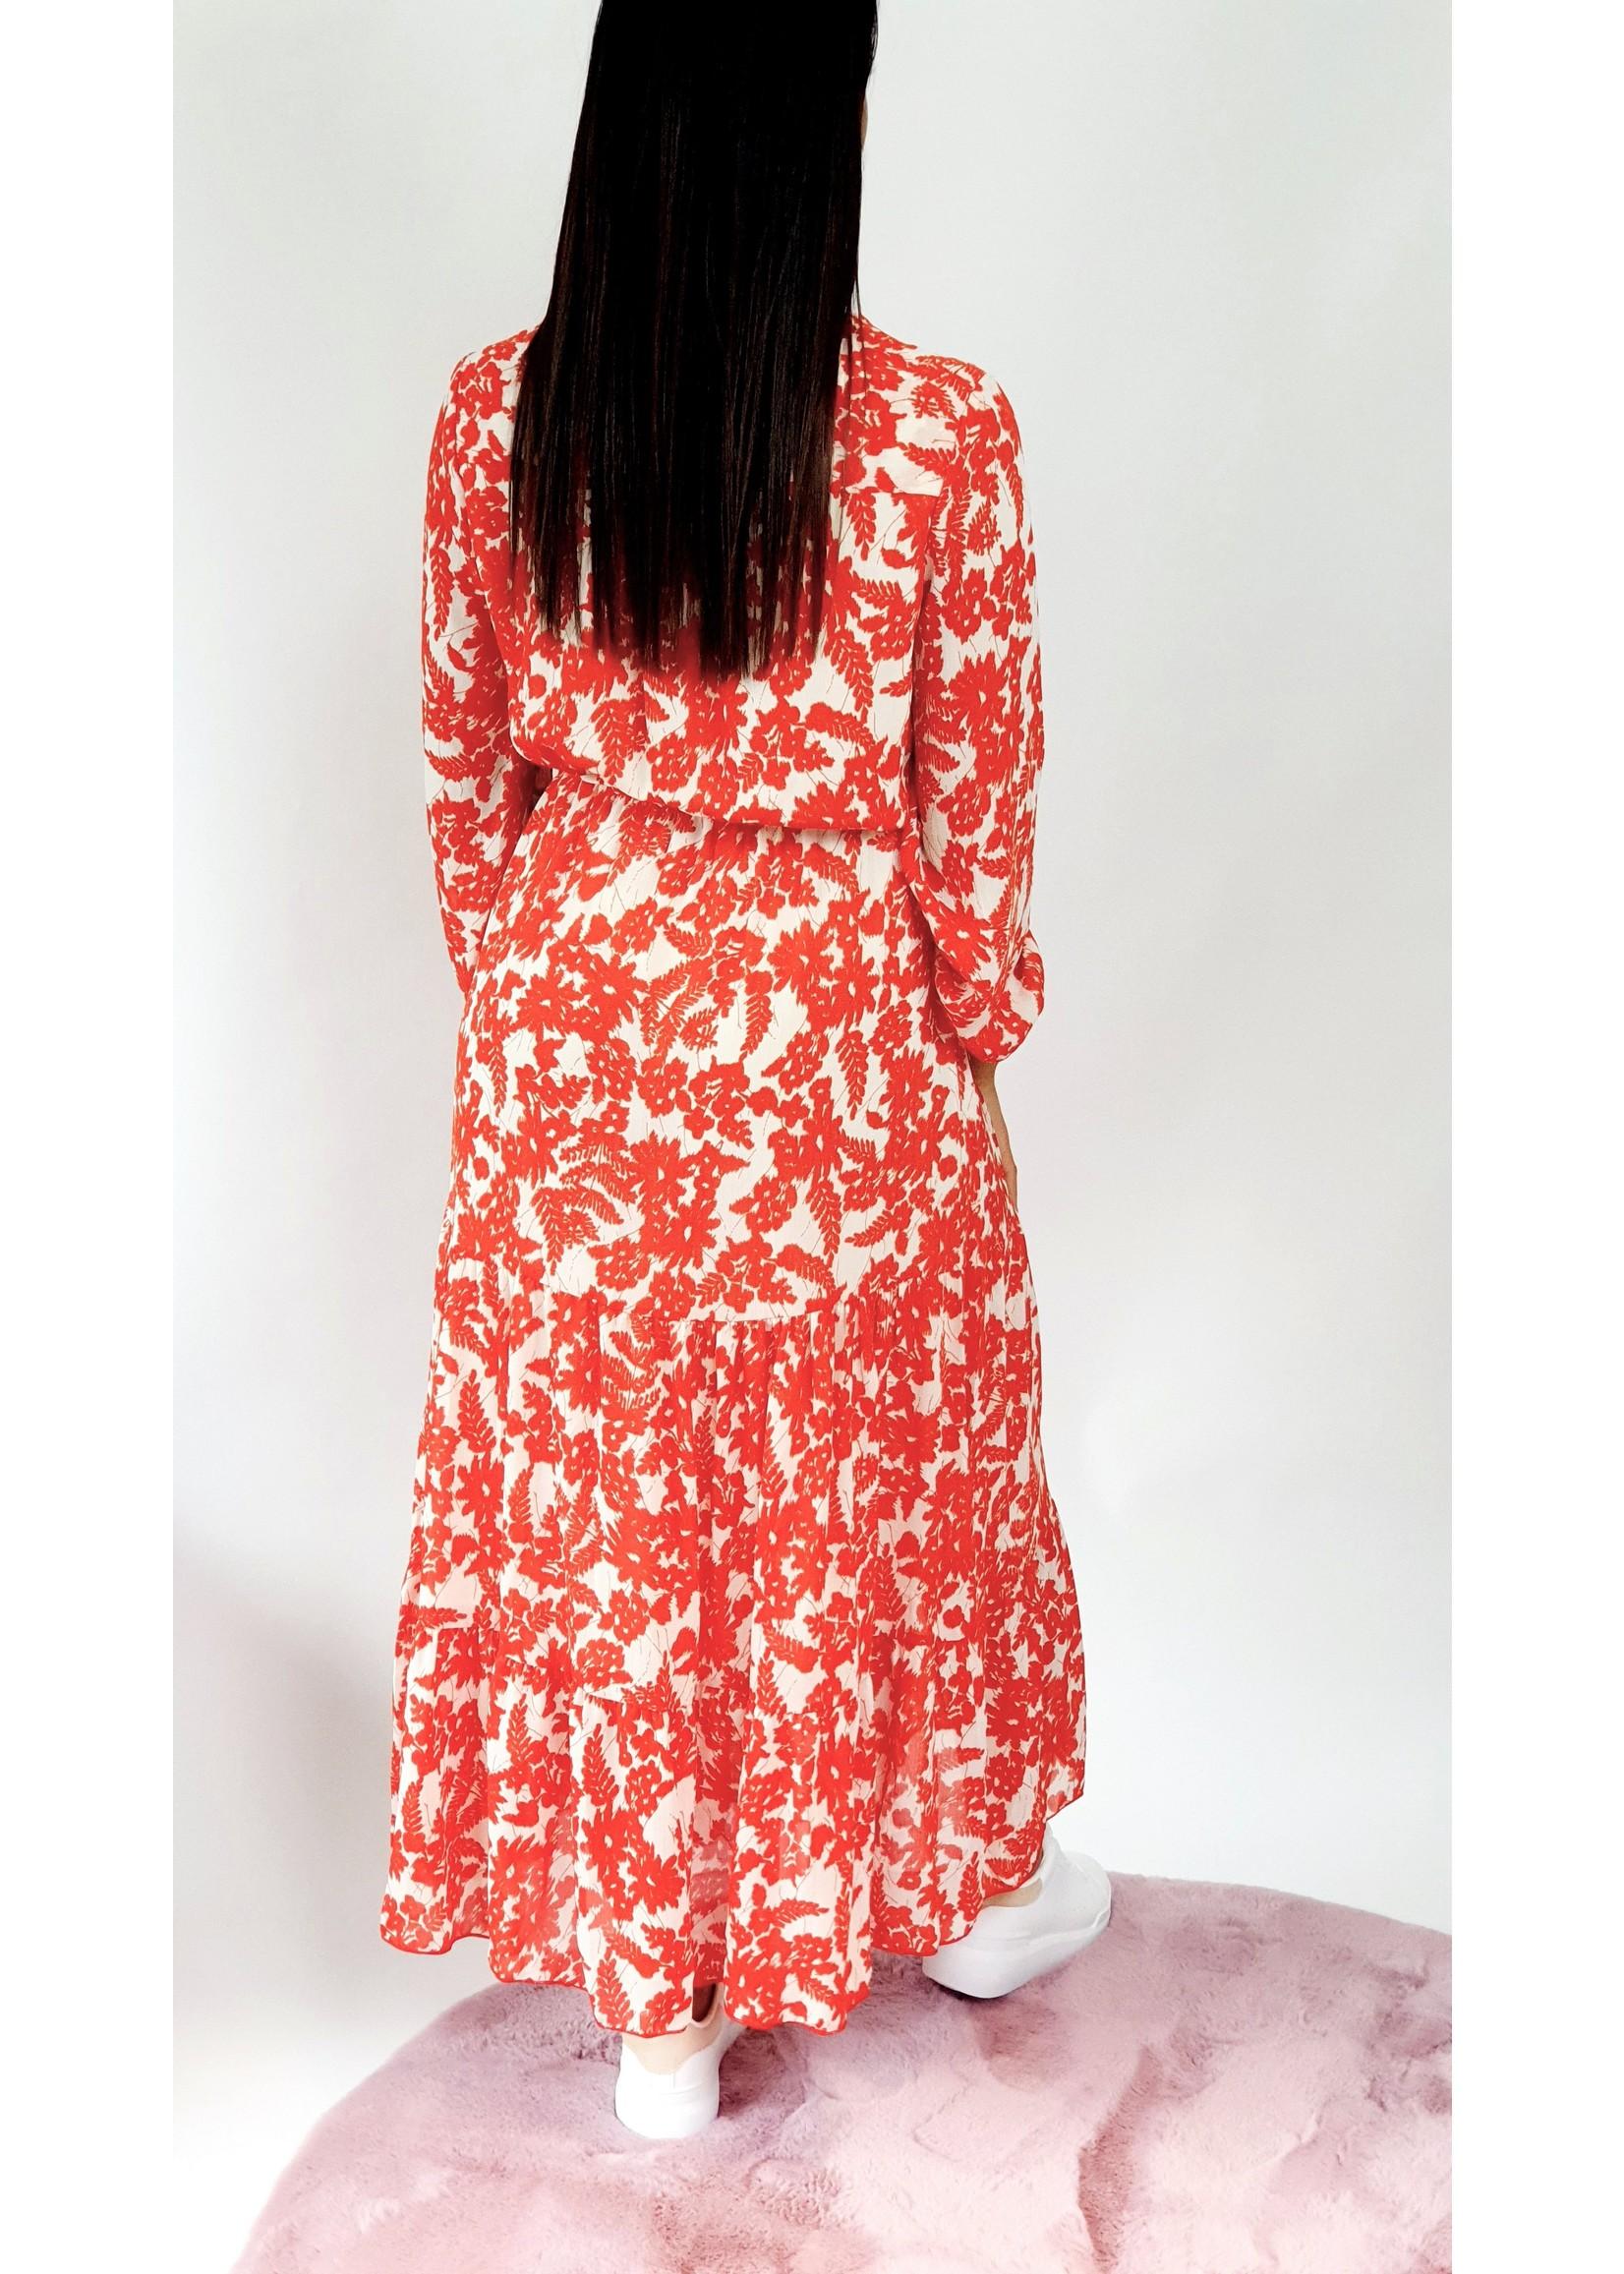 Thé red summer dress